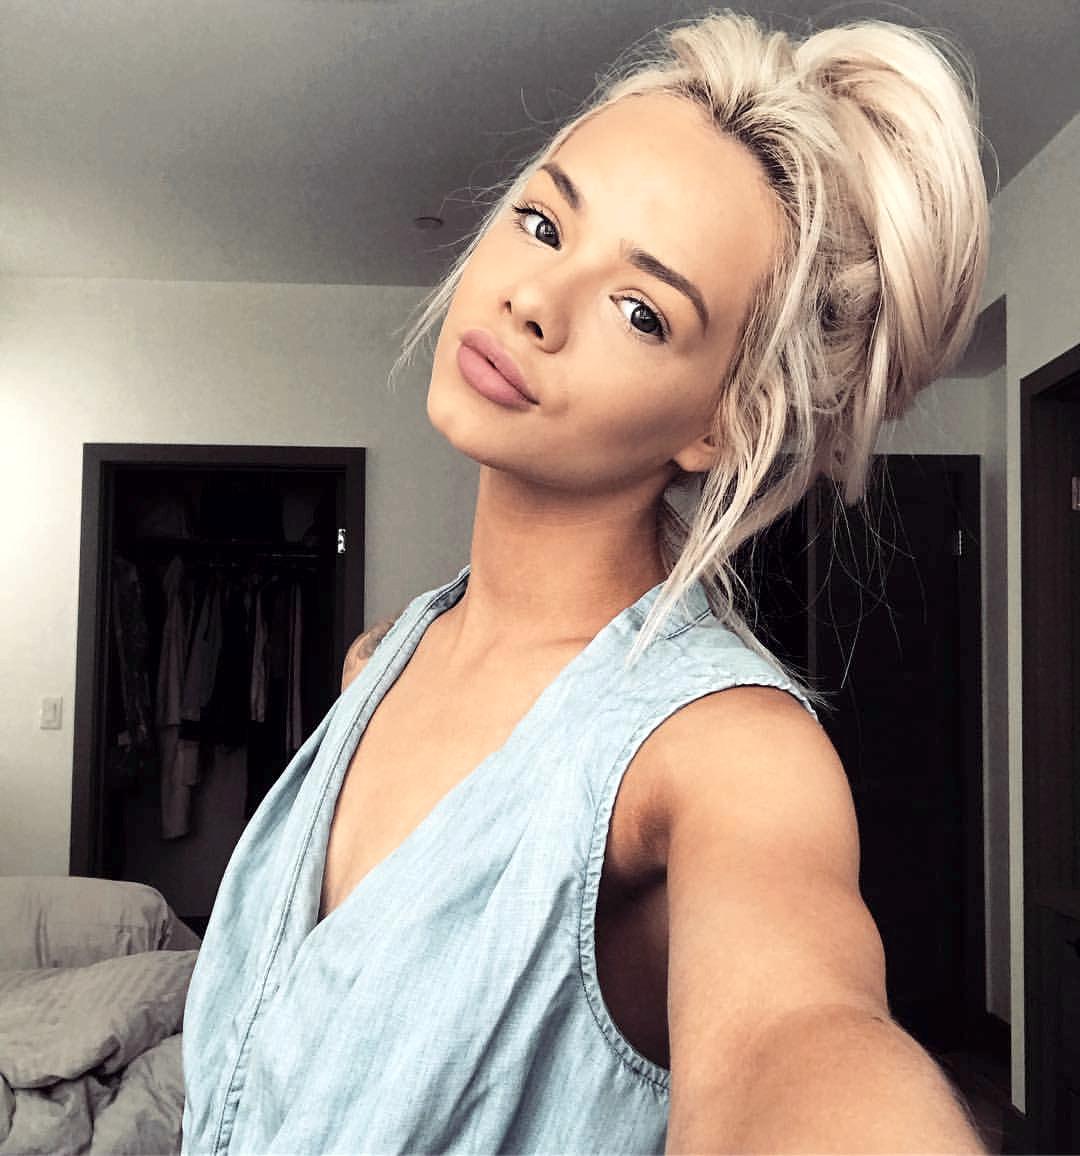 Who is petite blonde similar to elsa jean